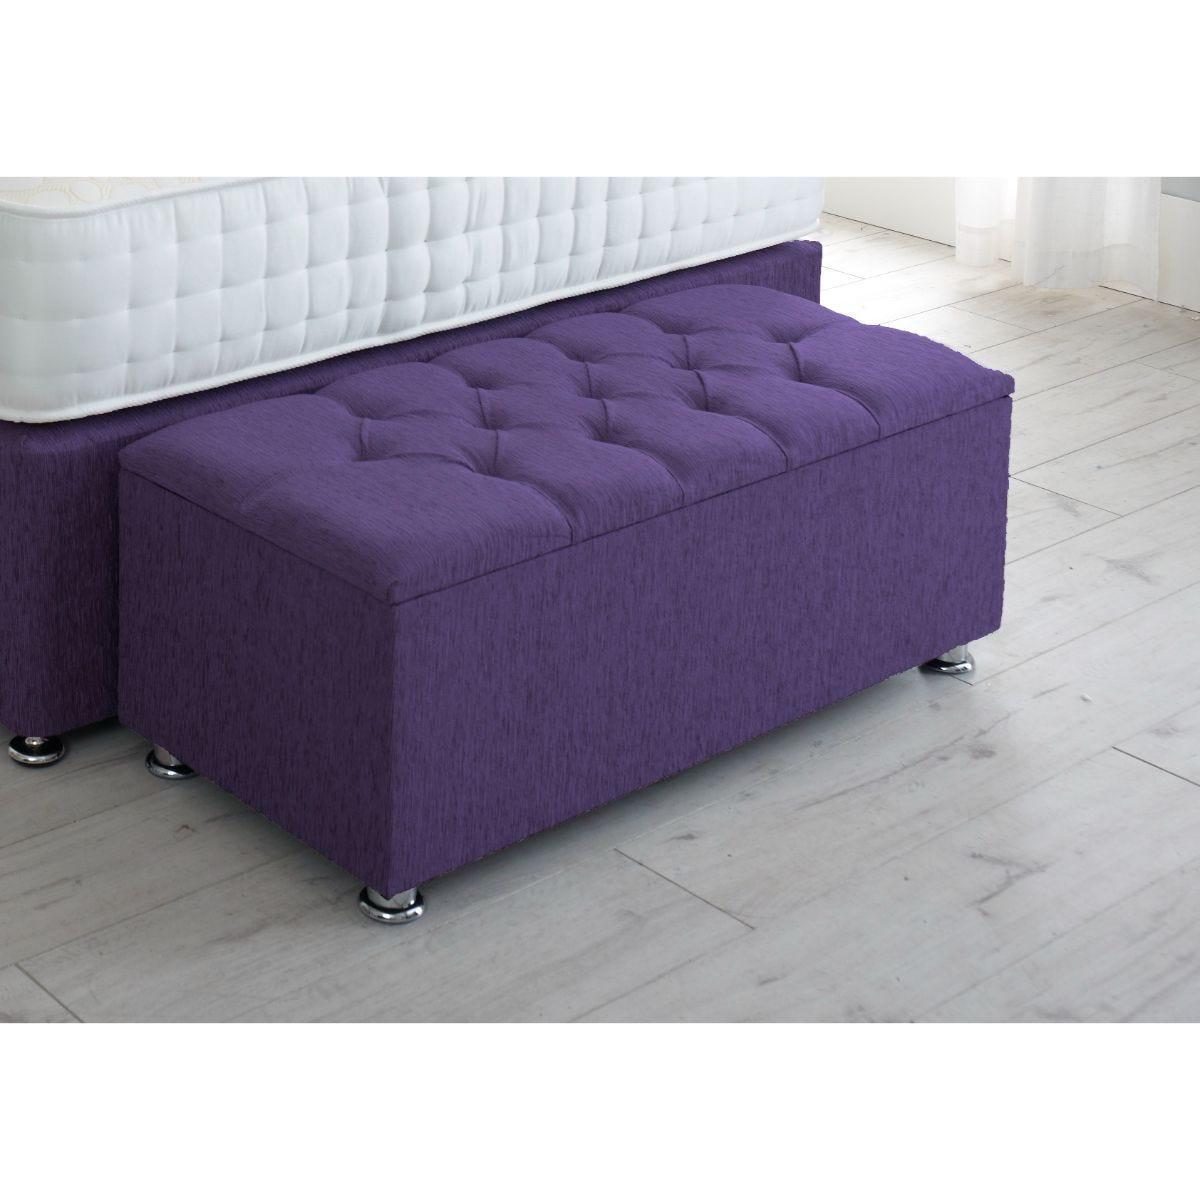 Serene Living Chesterfield Chenille Gas Lift Ottoman Storage Box Purple